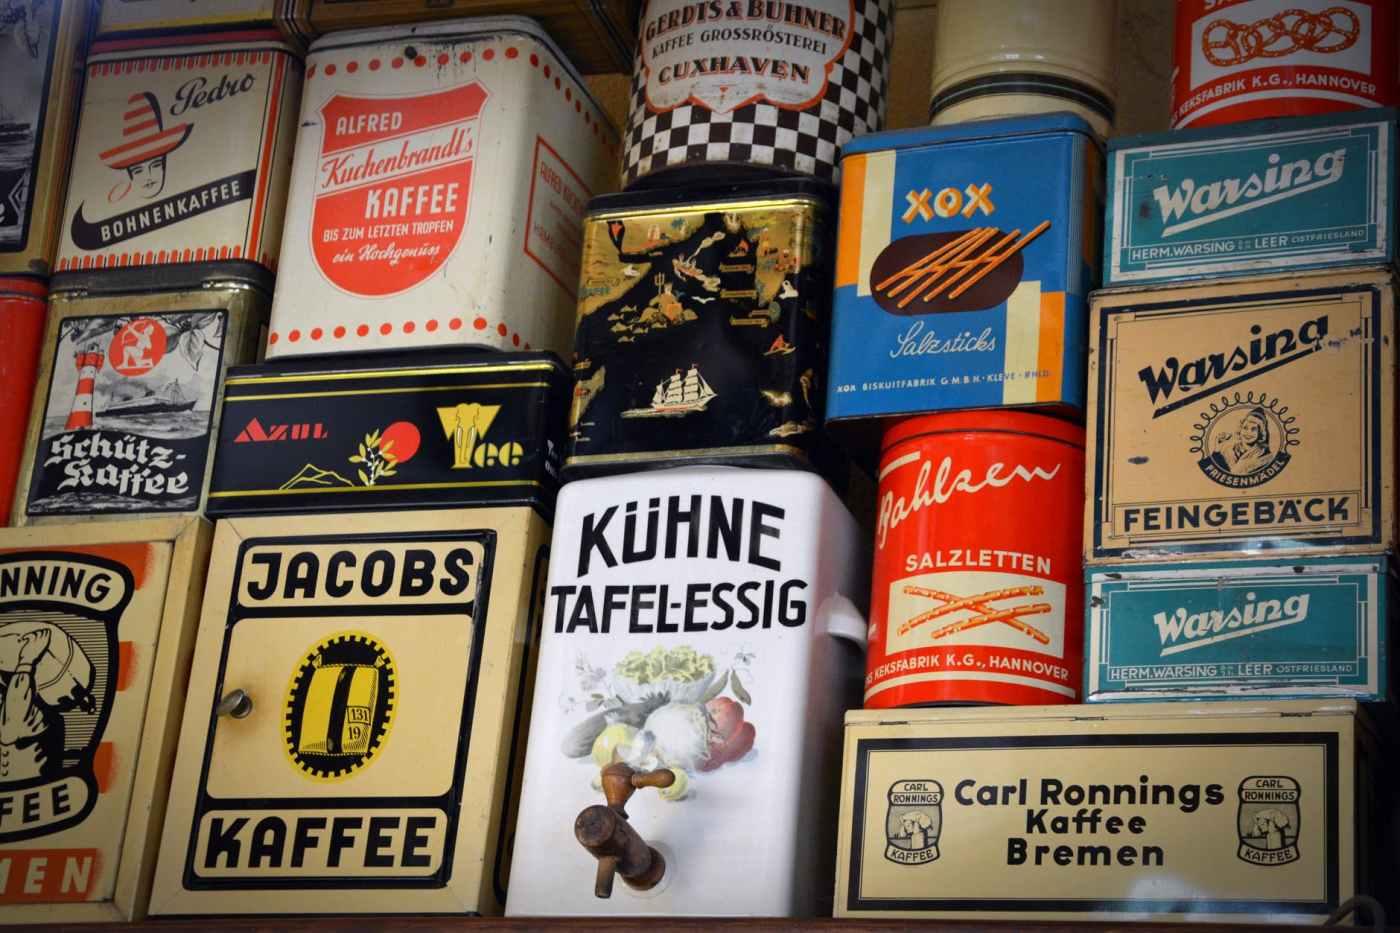 sale-shelf-old-cans-food-162927.jpeg